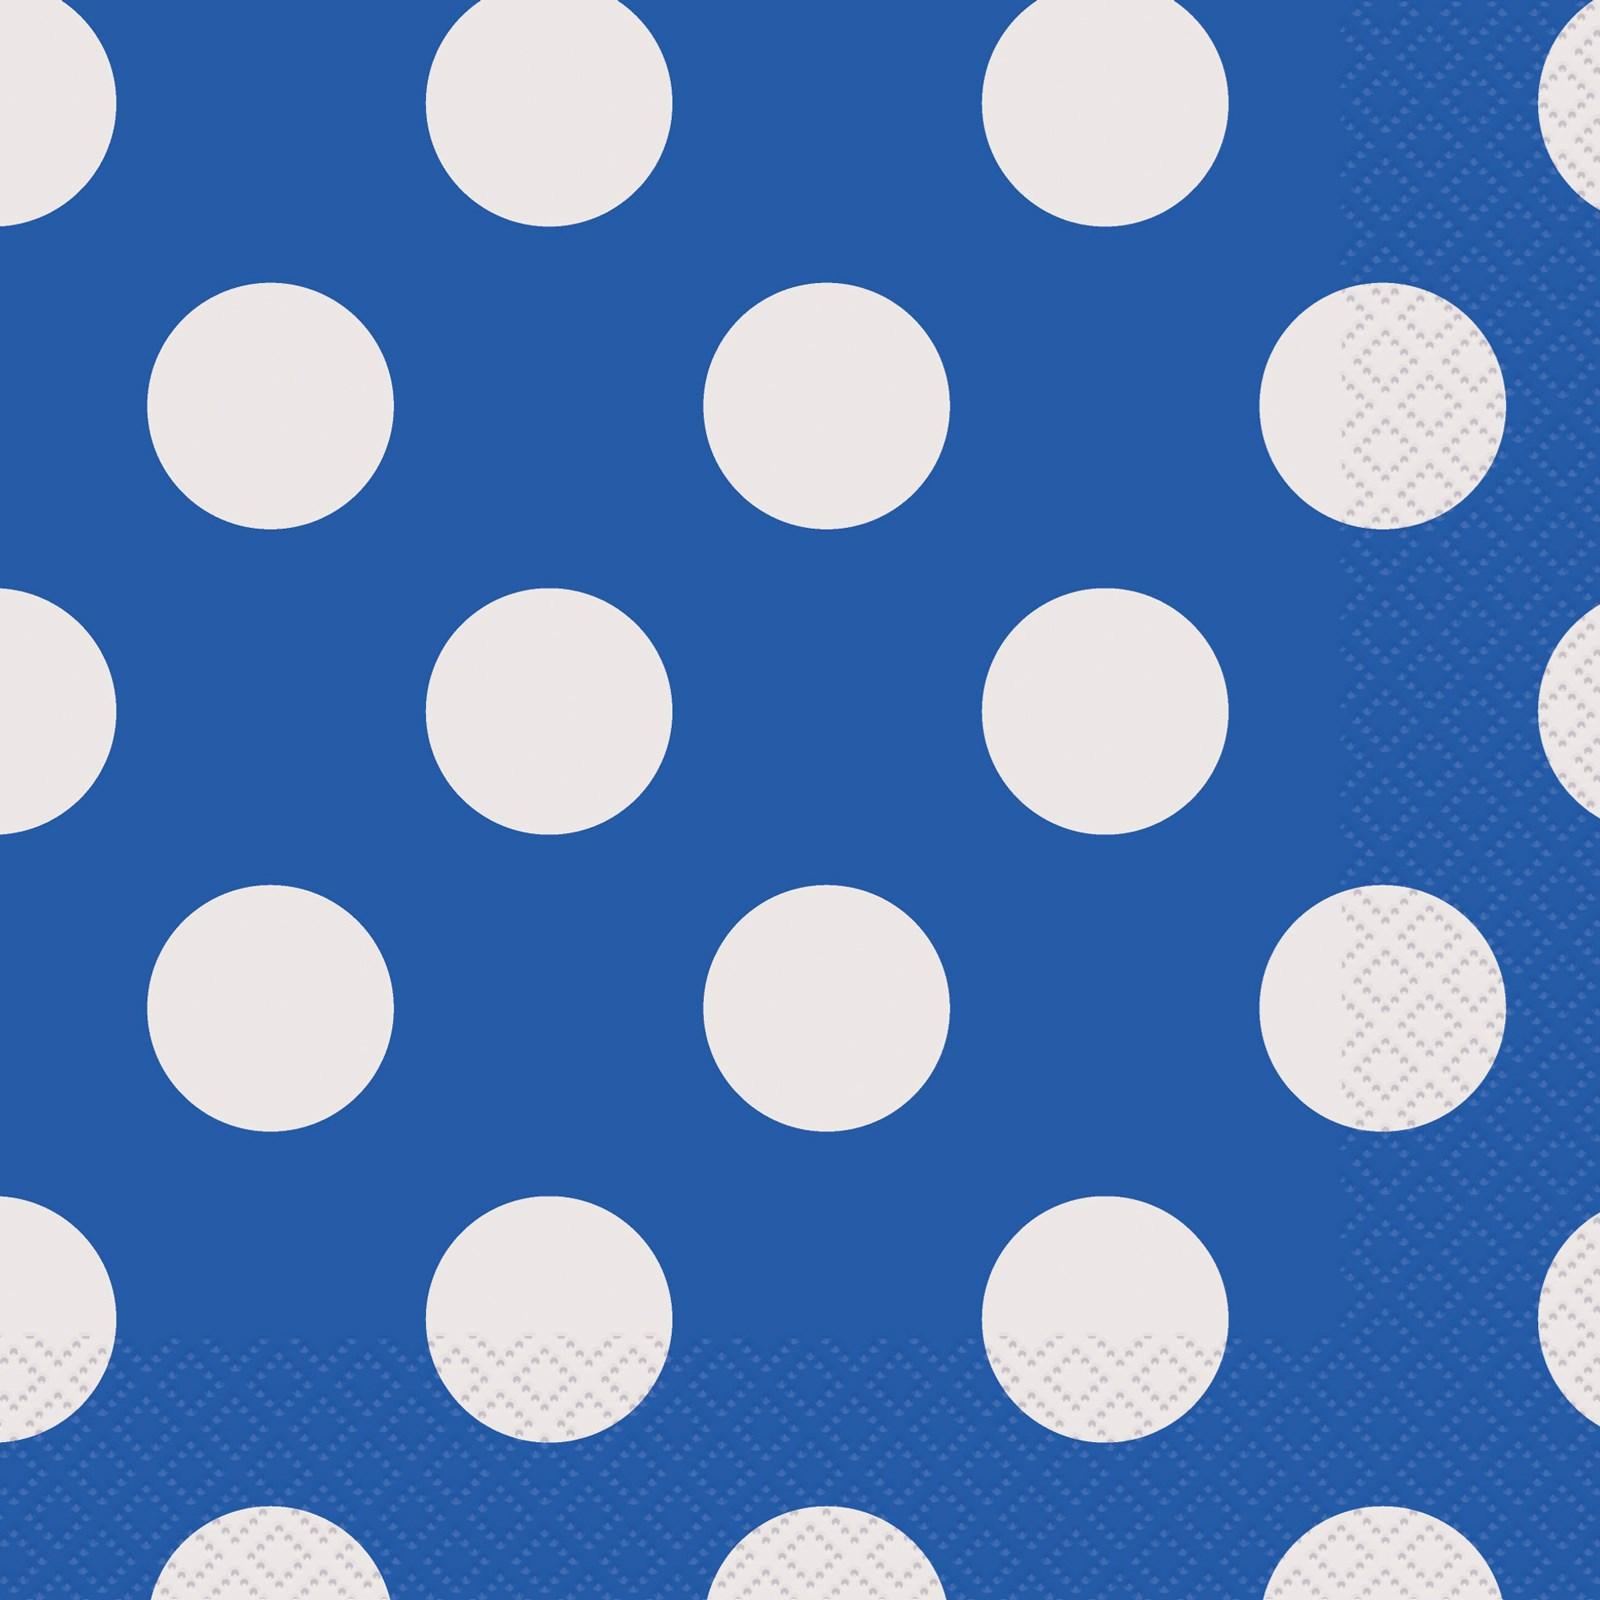 Blue And White Dots Lunch Napkins 16 BirthdayExpresscom